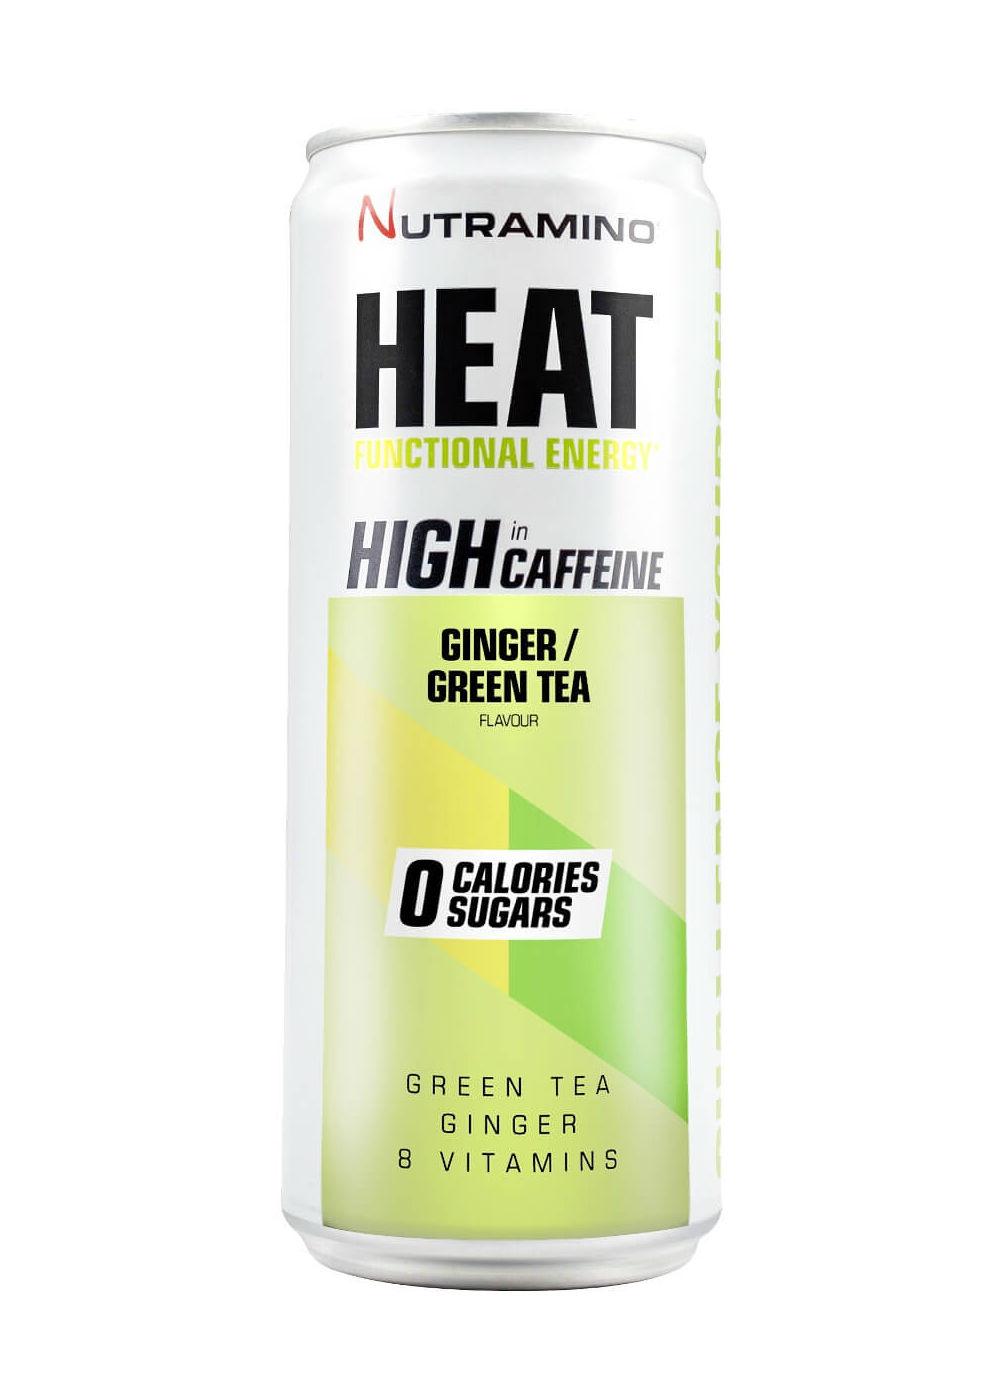 nutramino-heat-ginger-green-tea-can-p222